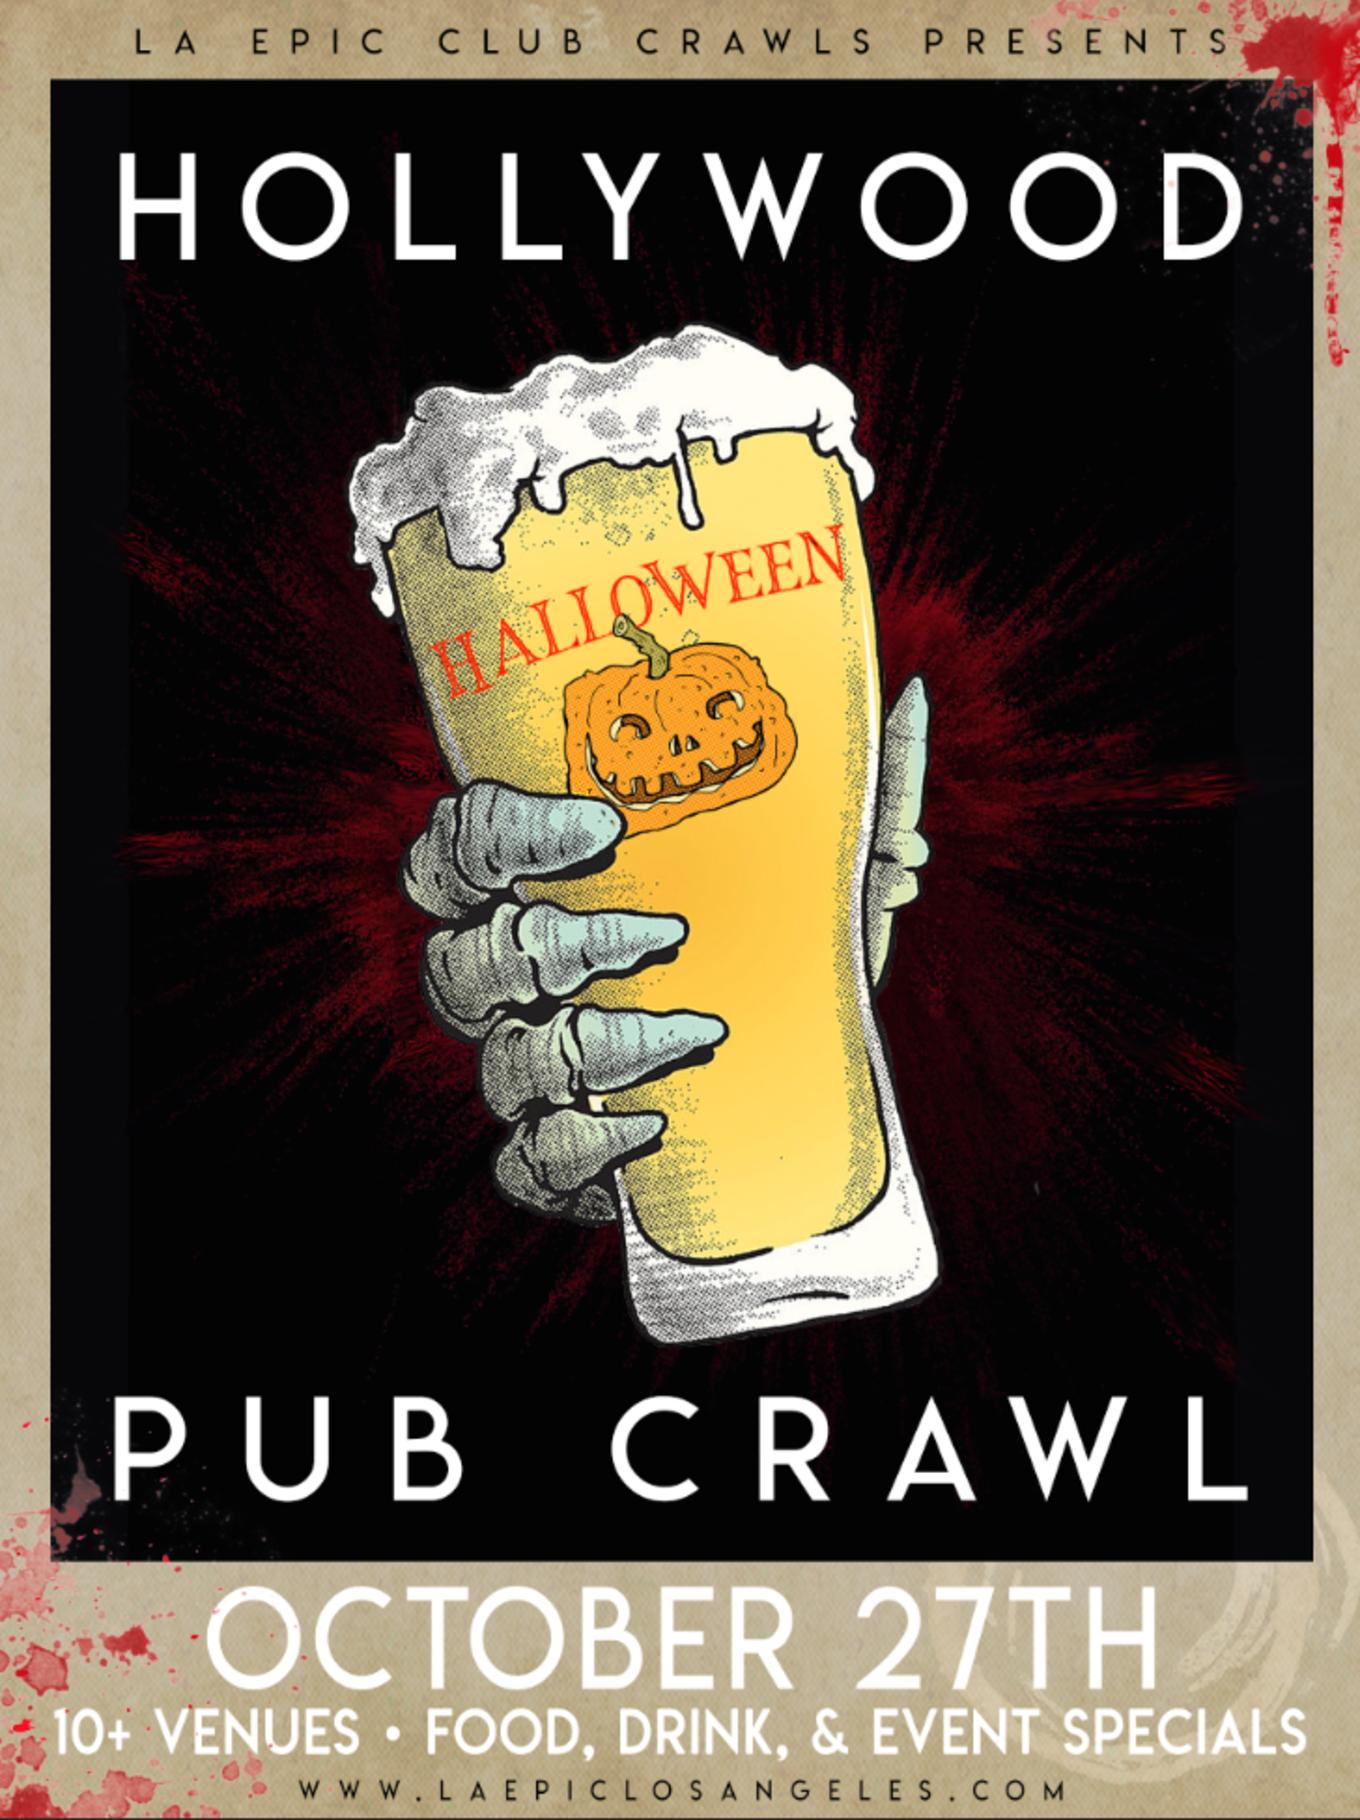 hollywood halloween pub crawl (day crawl) - tickets - cabo cantina